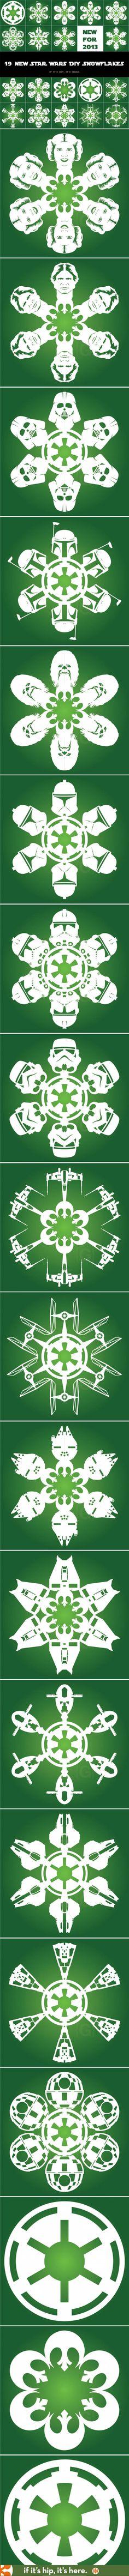 19 Awesome Star Wars DIY Snowflakes! www.ifitshipitshe...